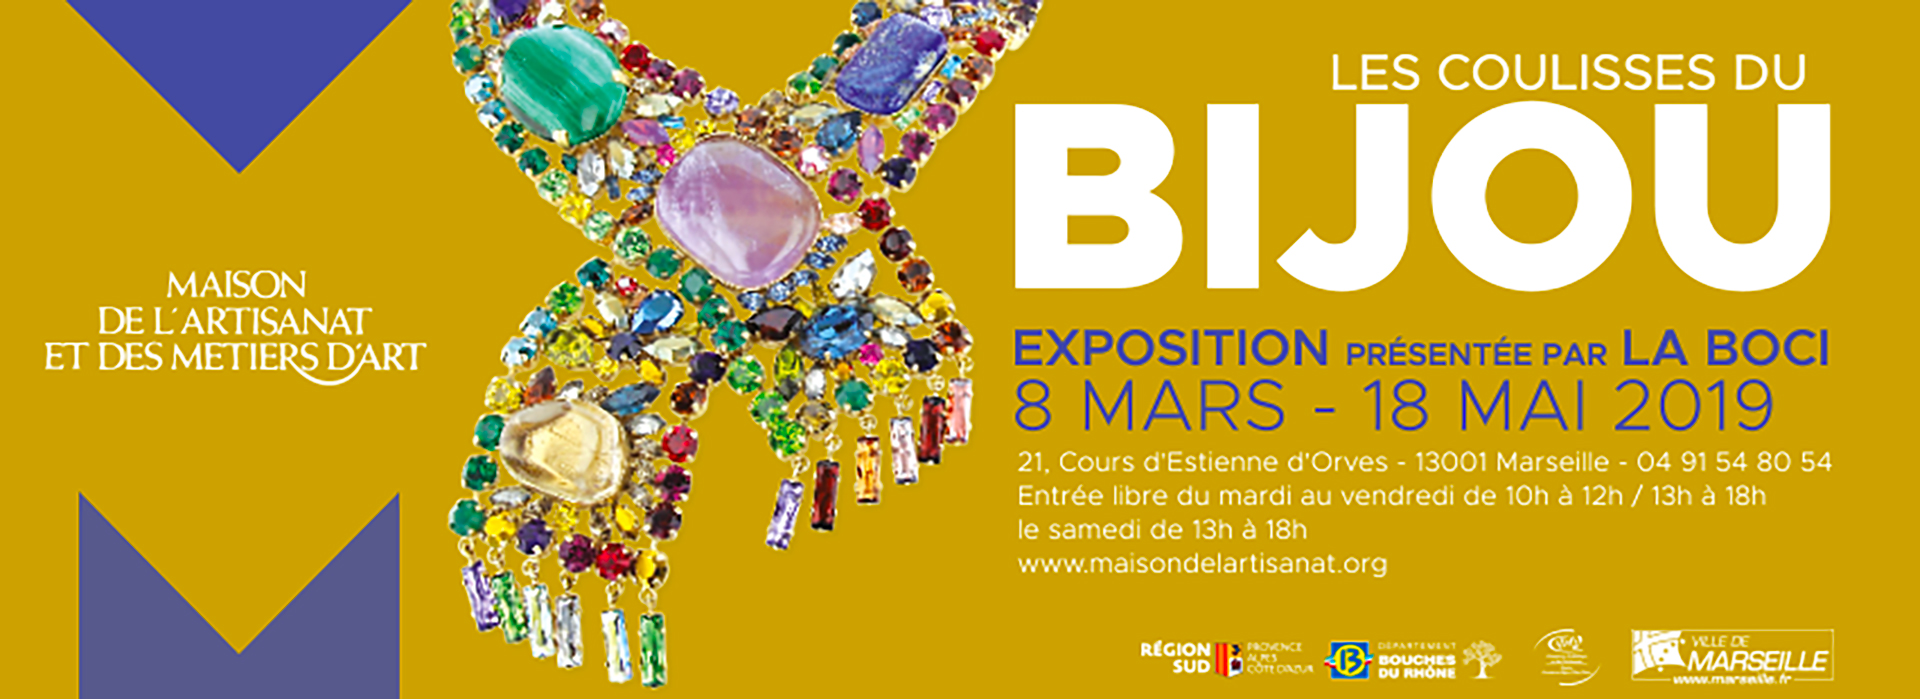 Exposition La Boci Marseille